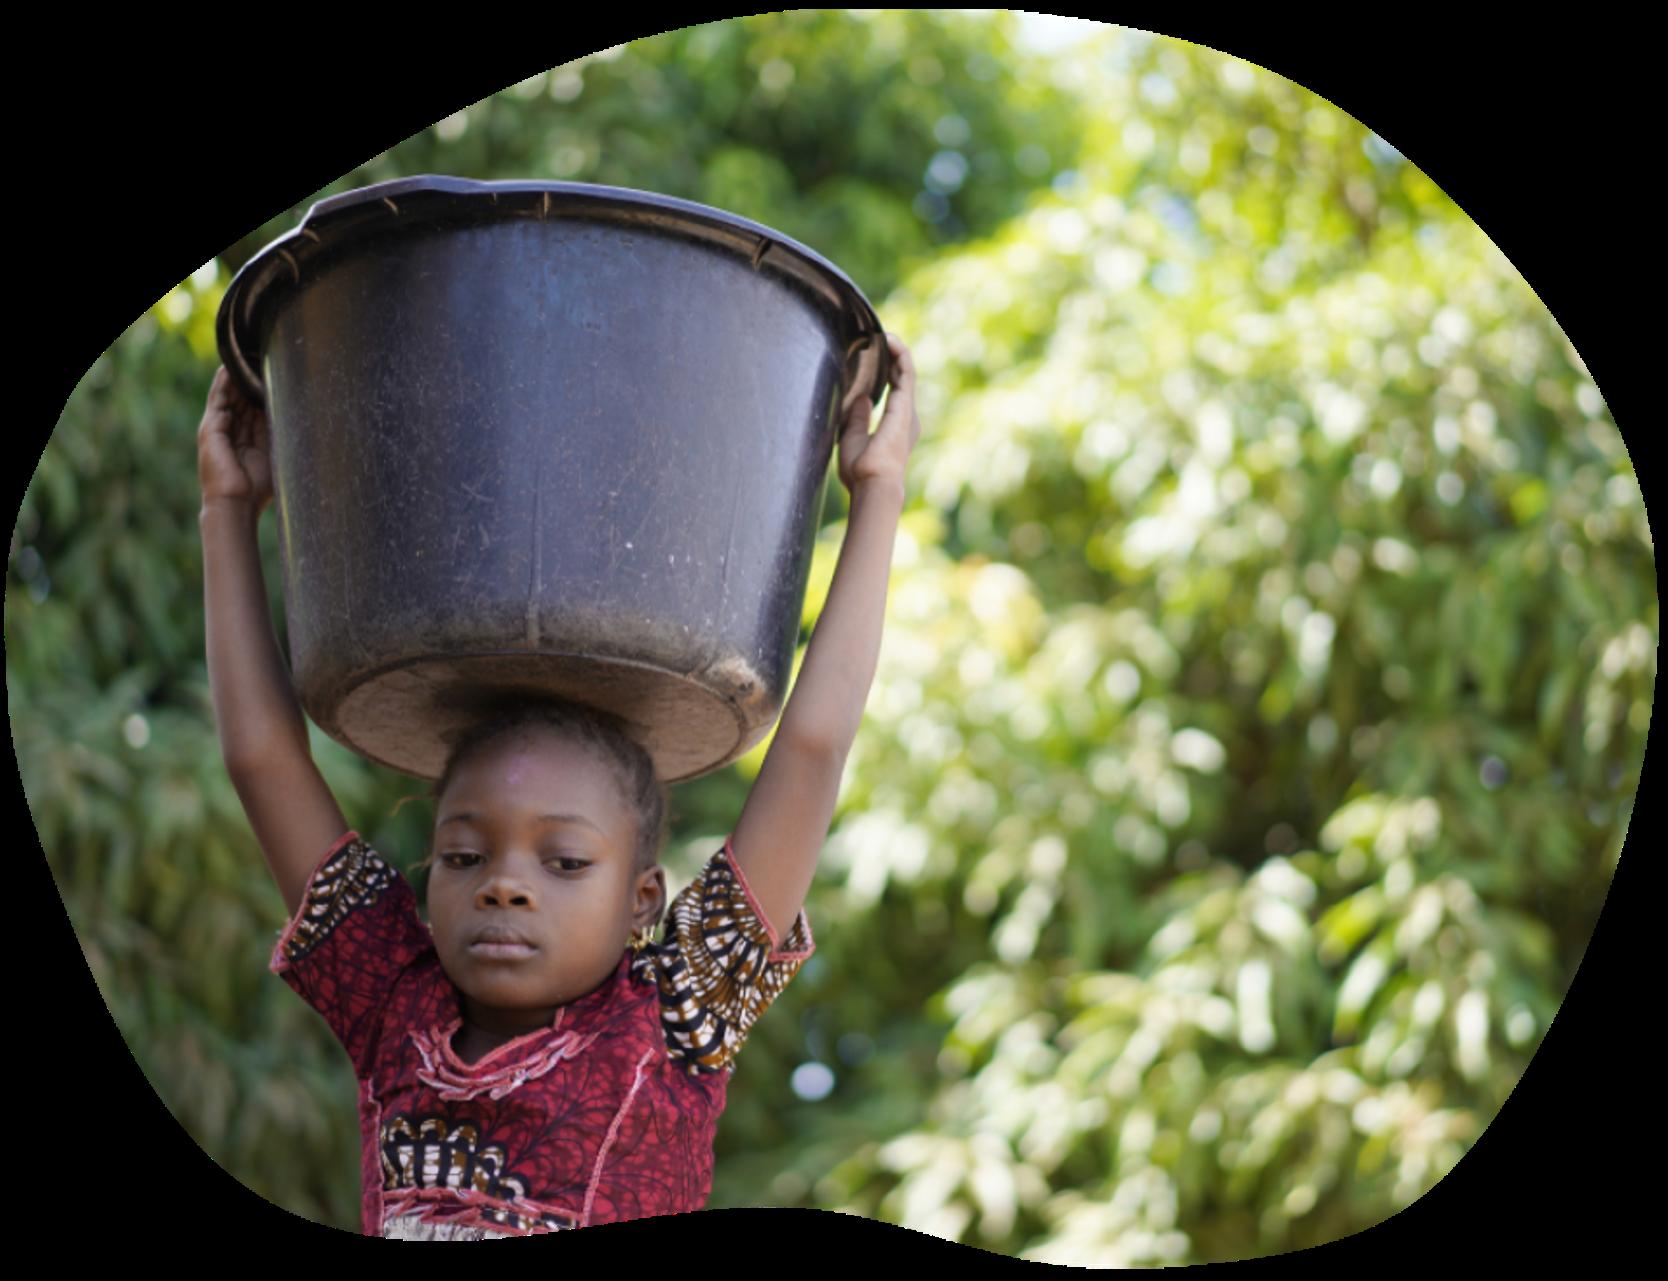 Child carrying large basin